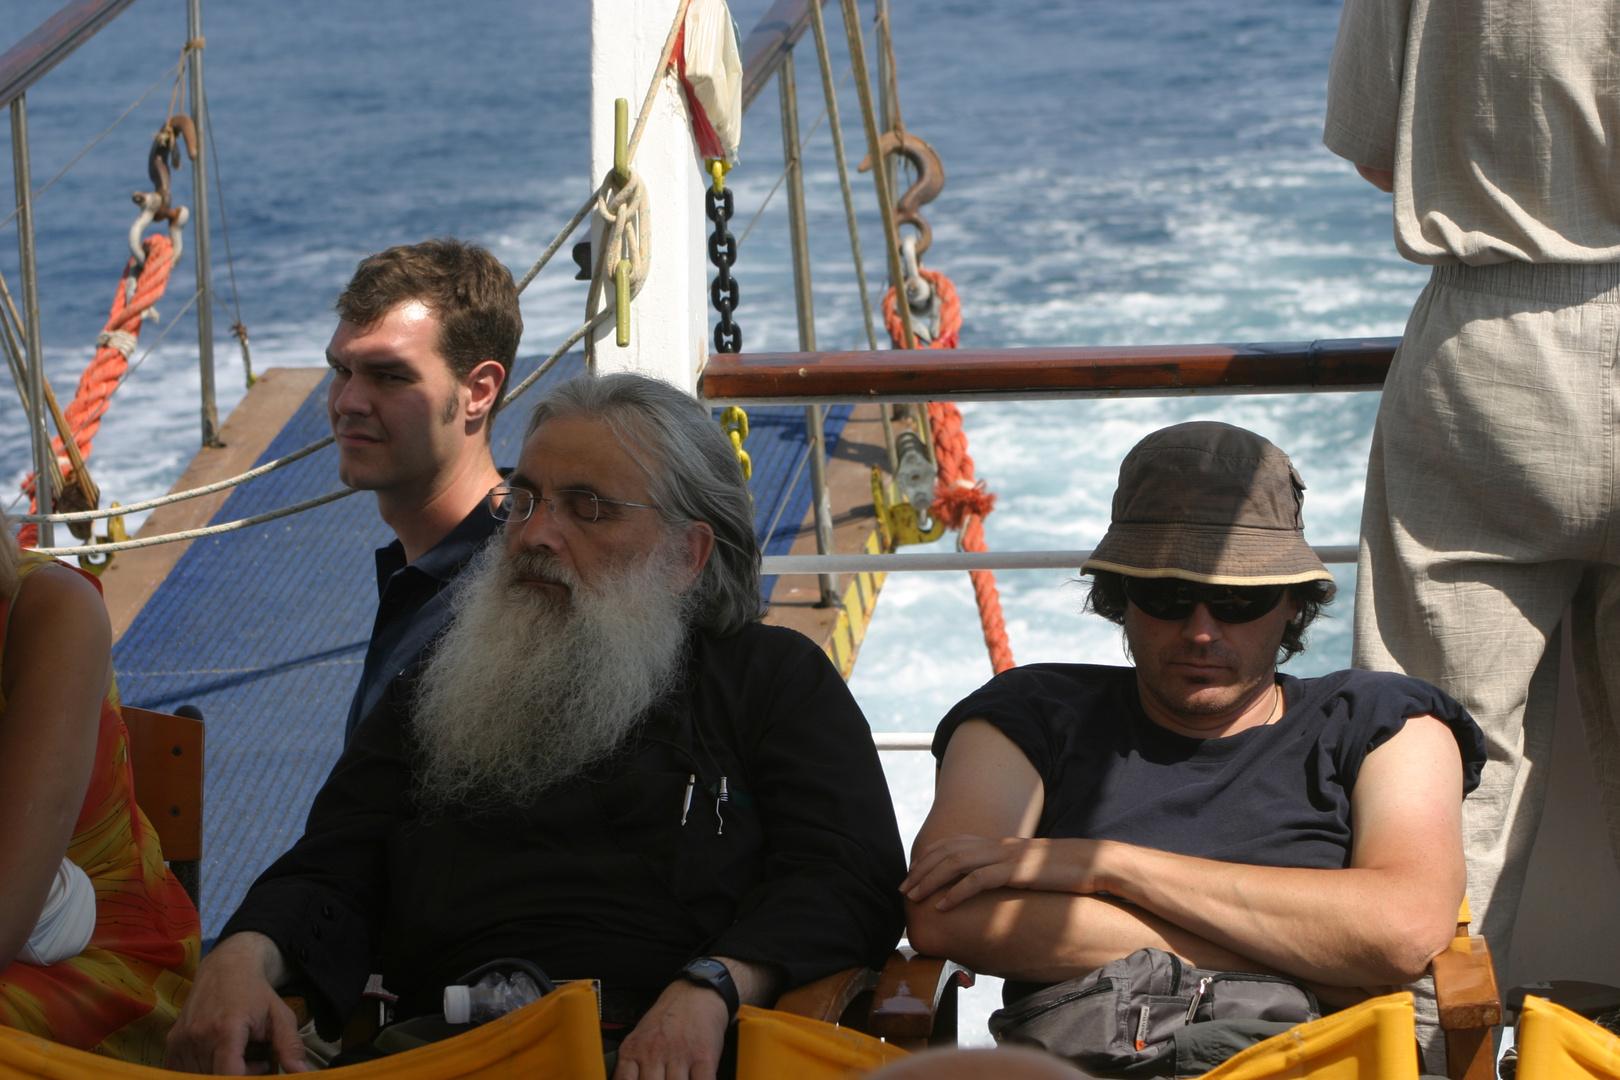 H. Athos2